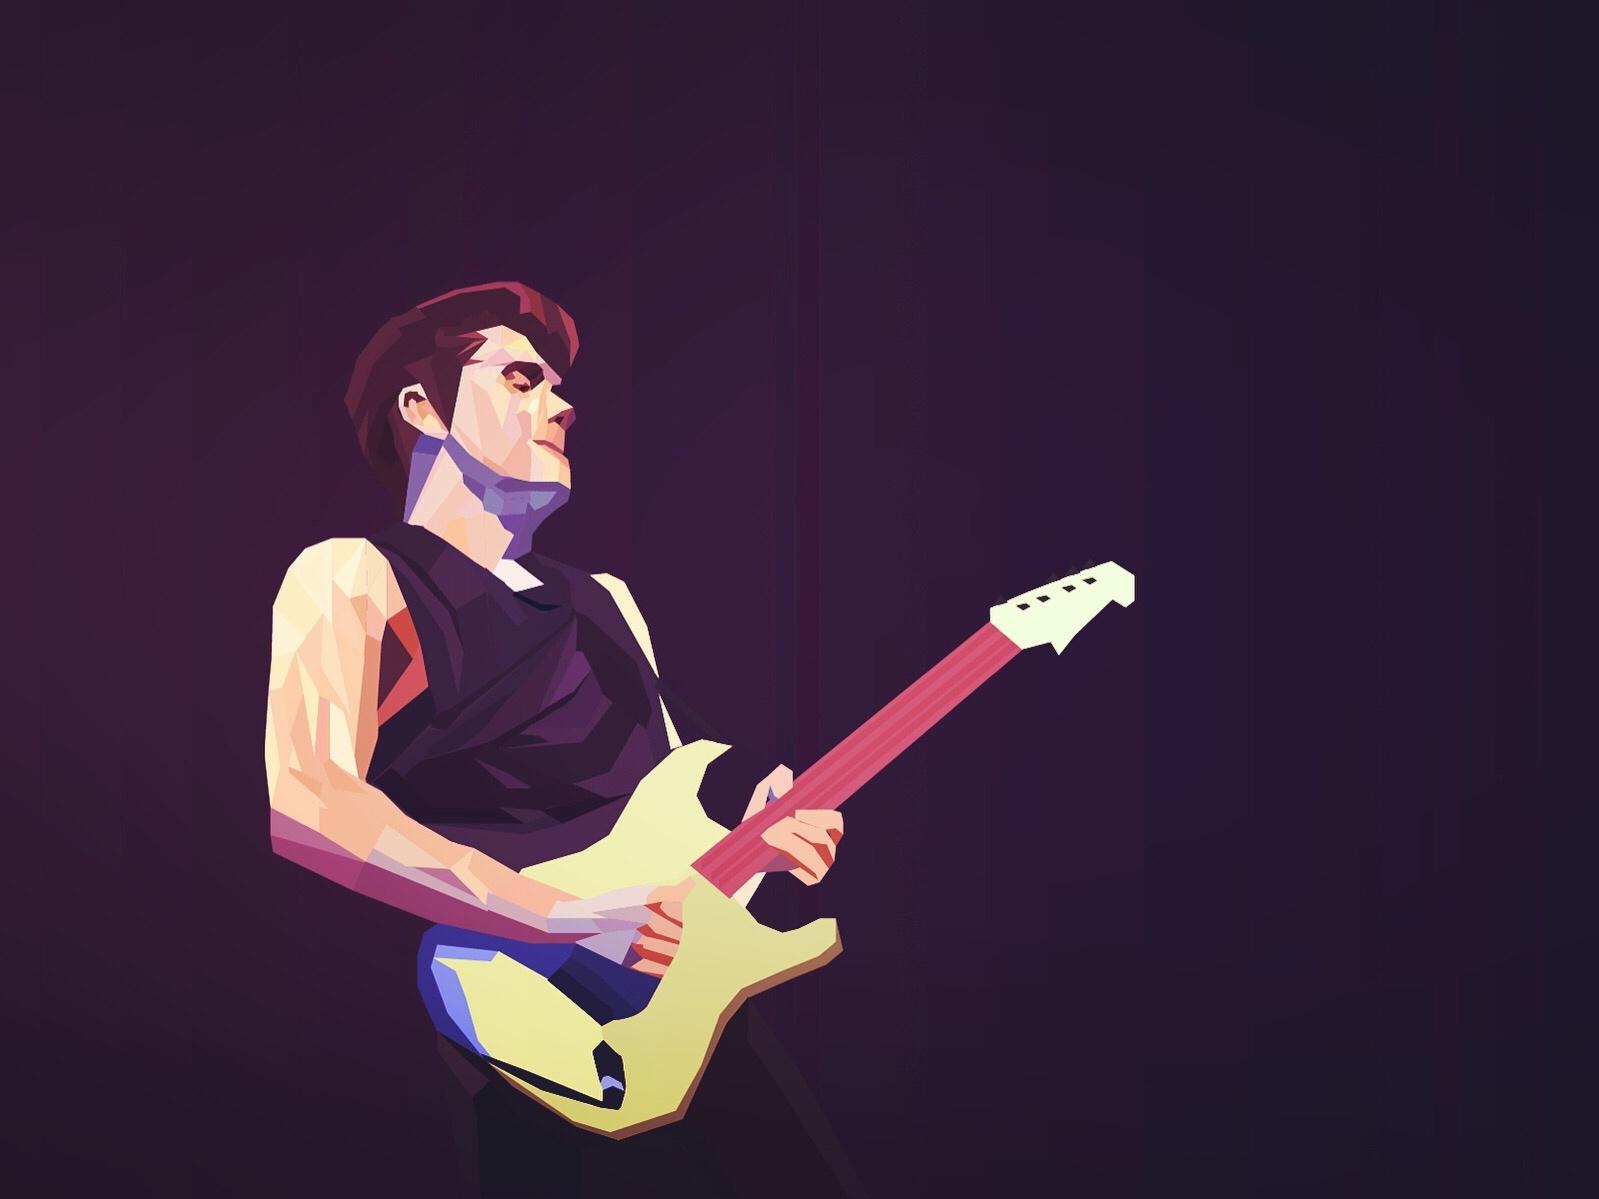 John Mayer illustration